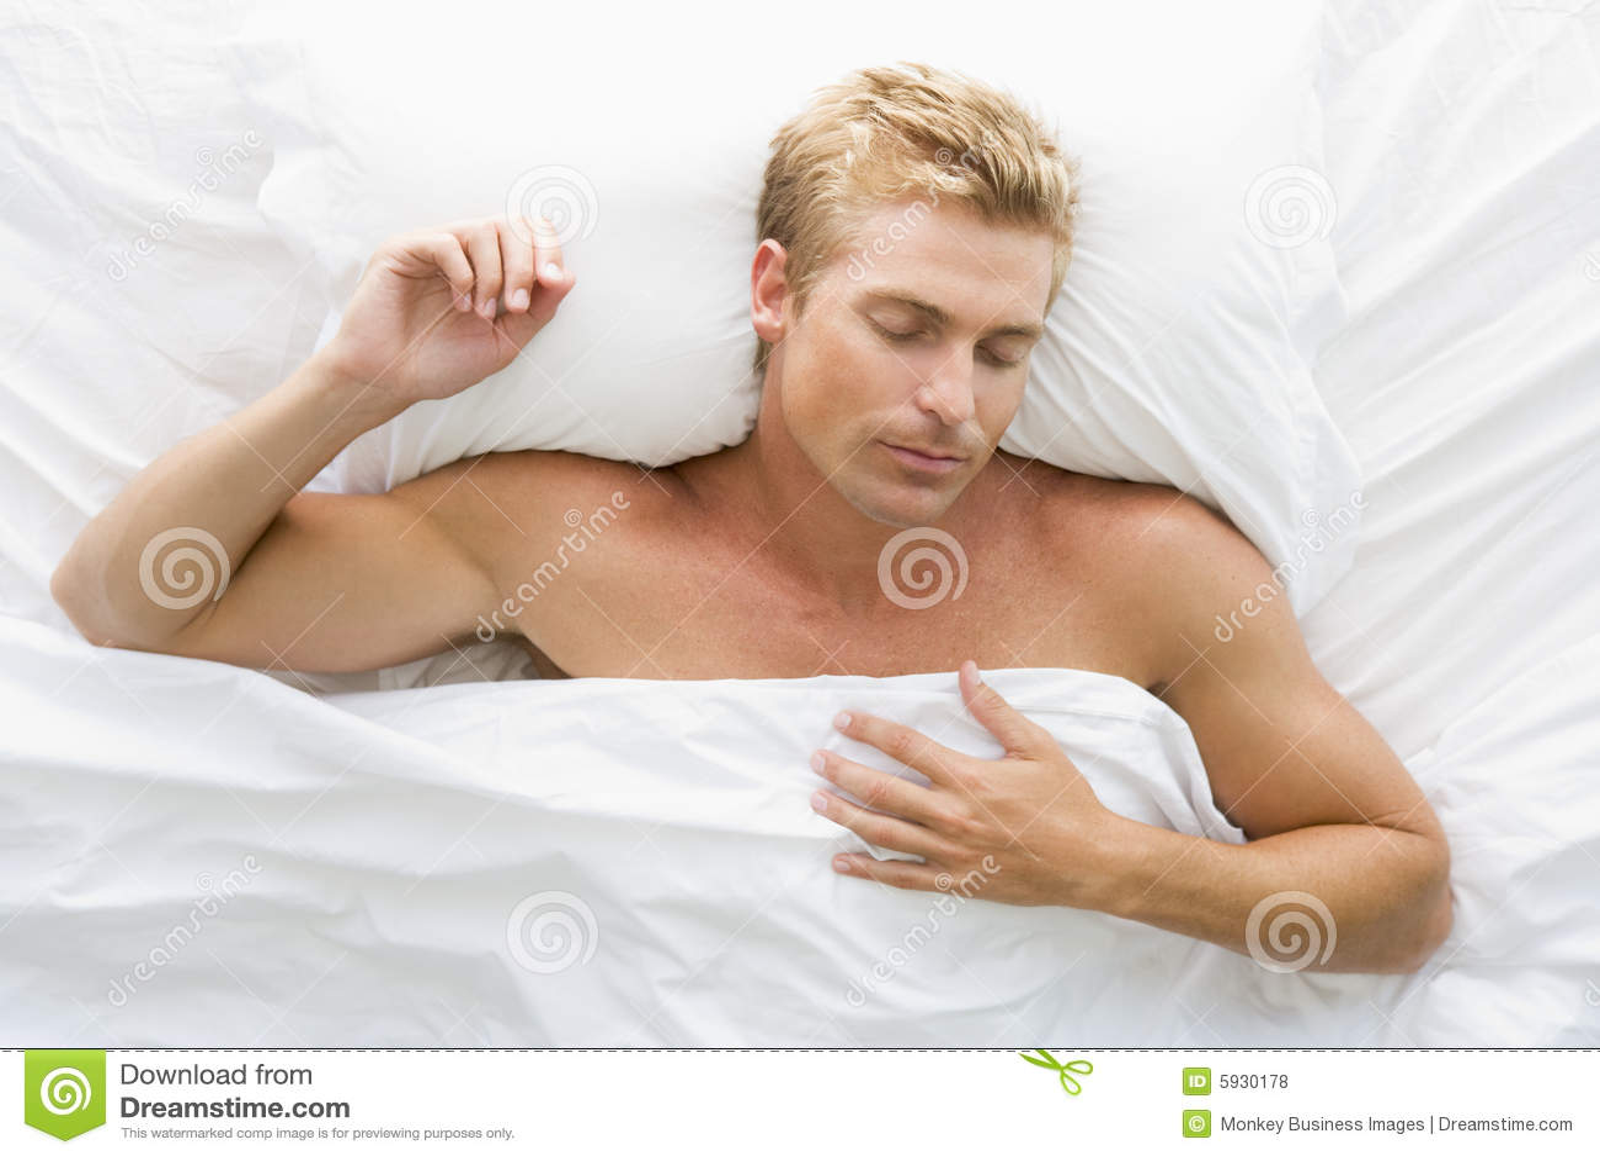 man lying in bed stock photo. image of half, horizontal - 5930178